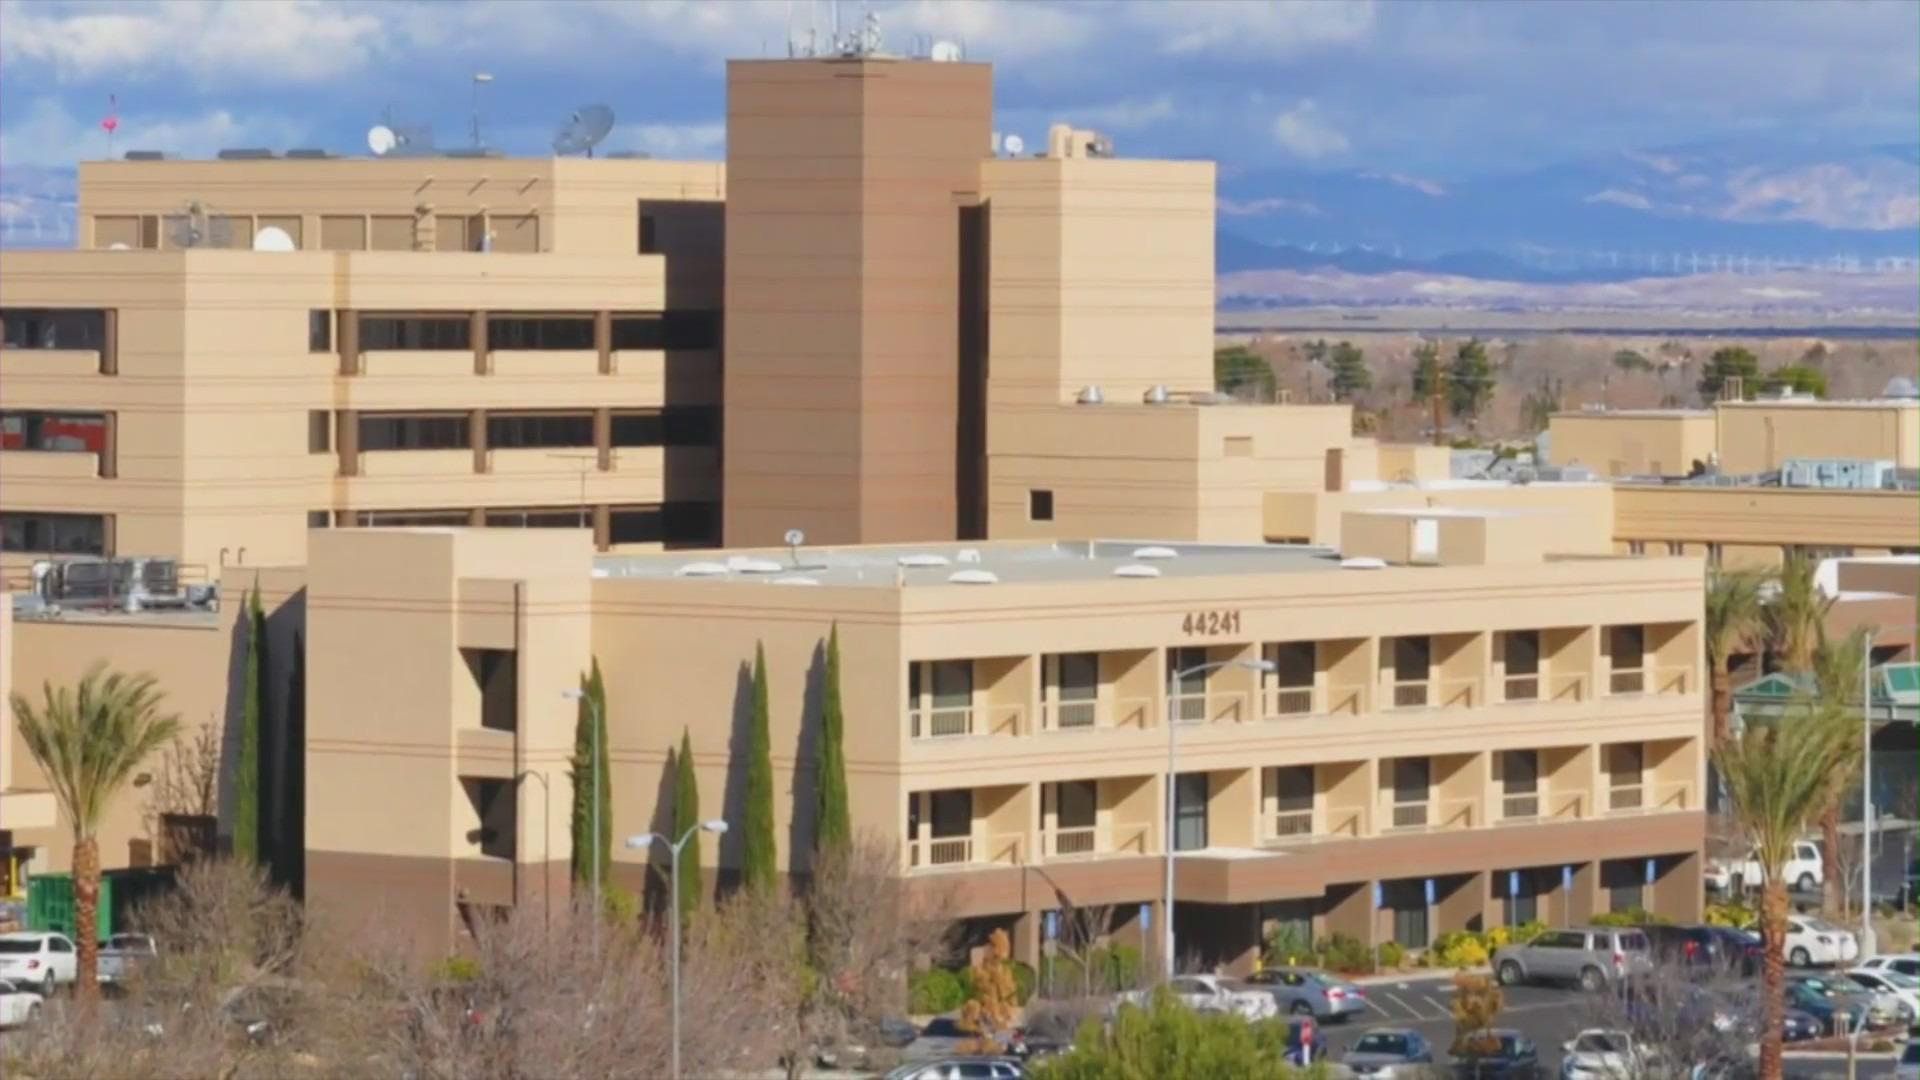 Antelope Valley Hospital in Lancaster is seen in a file photo. (KTLA)